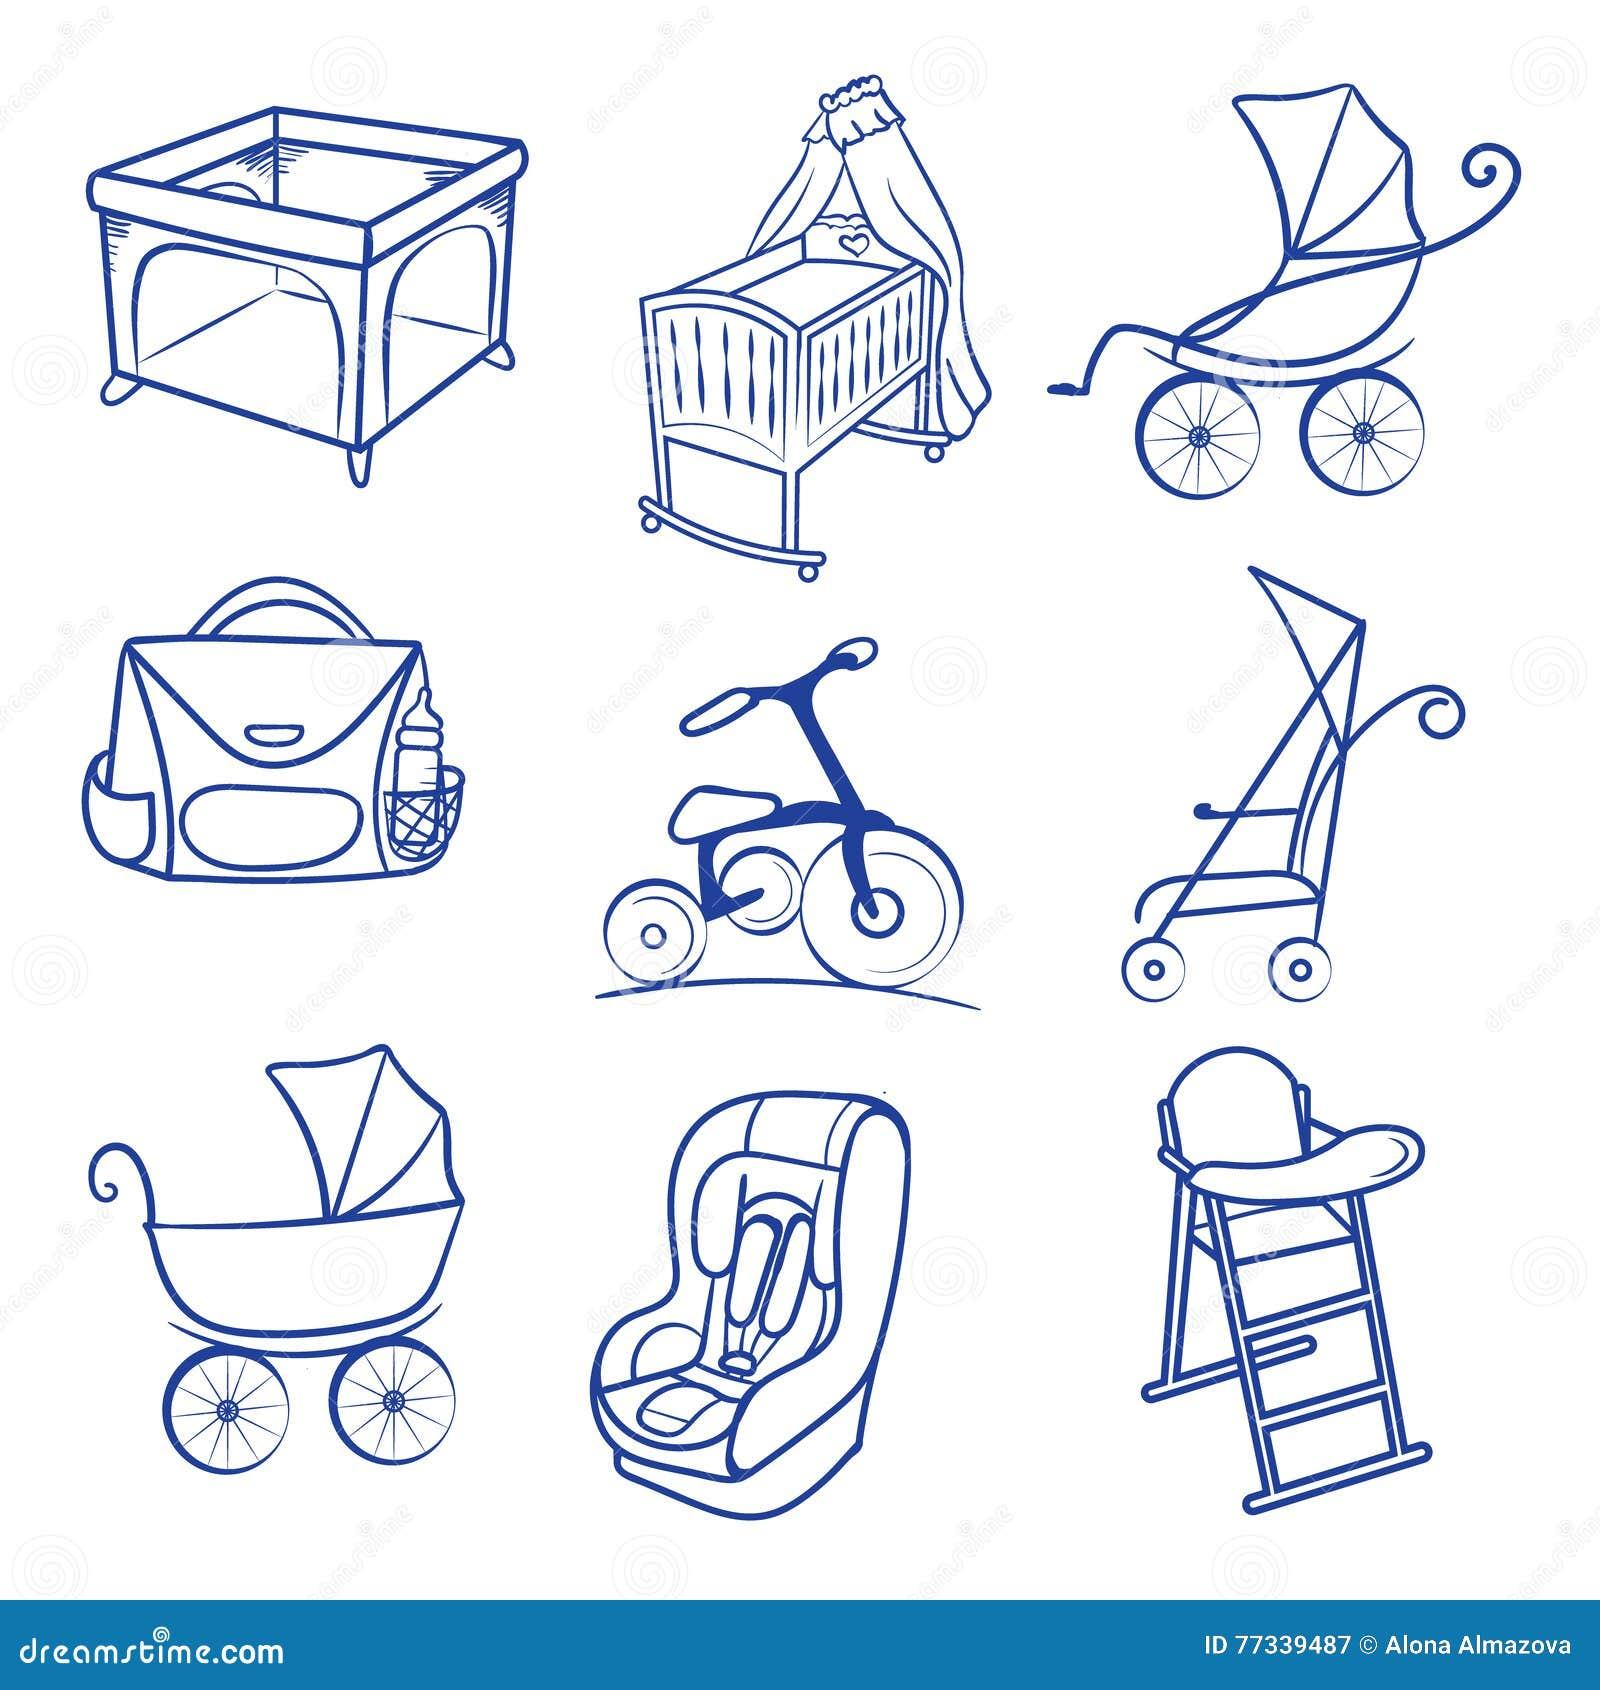 Baby Car Seat Pram Bag Cradle Carriage Playpen Icons